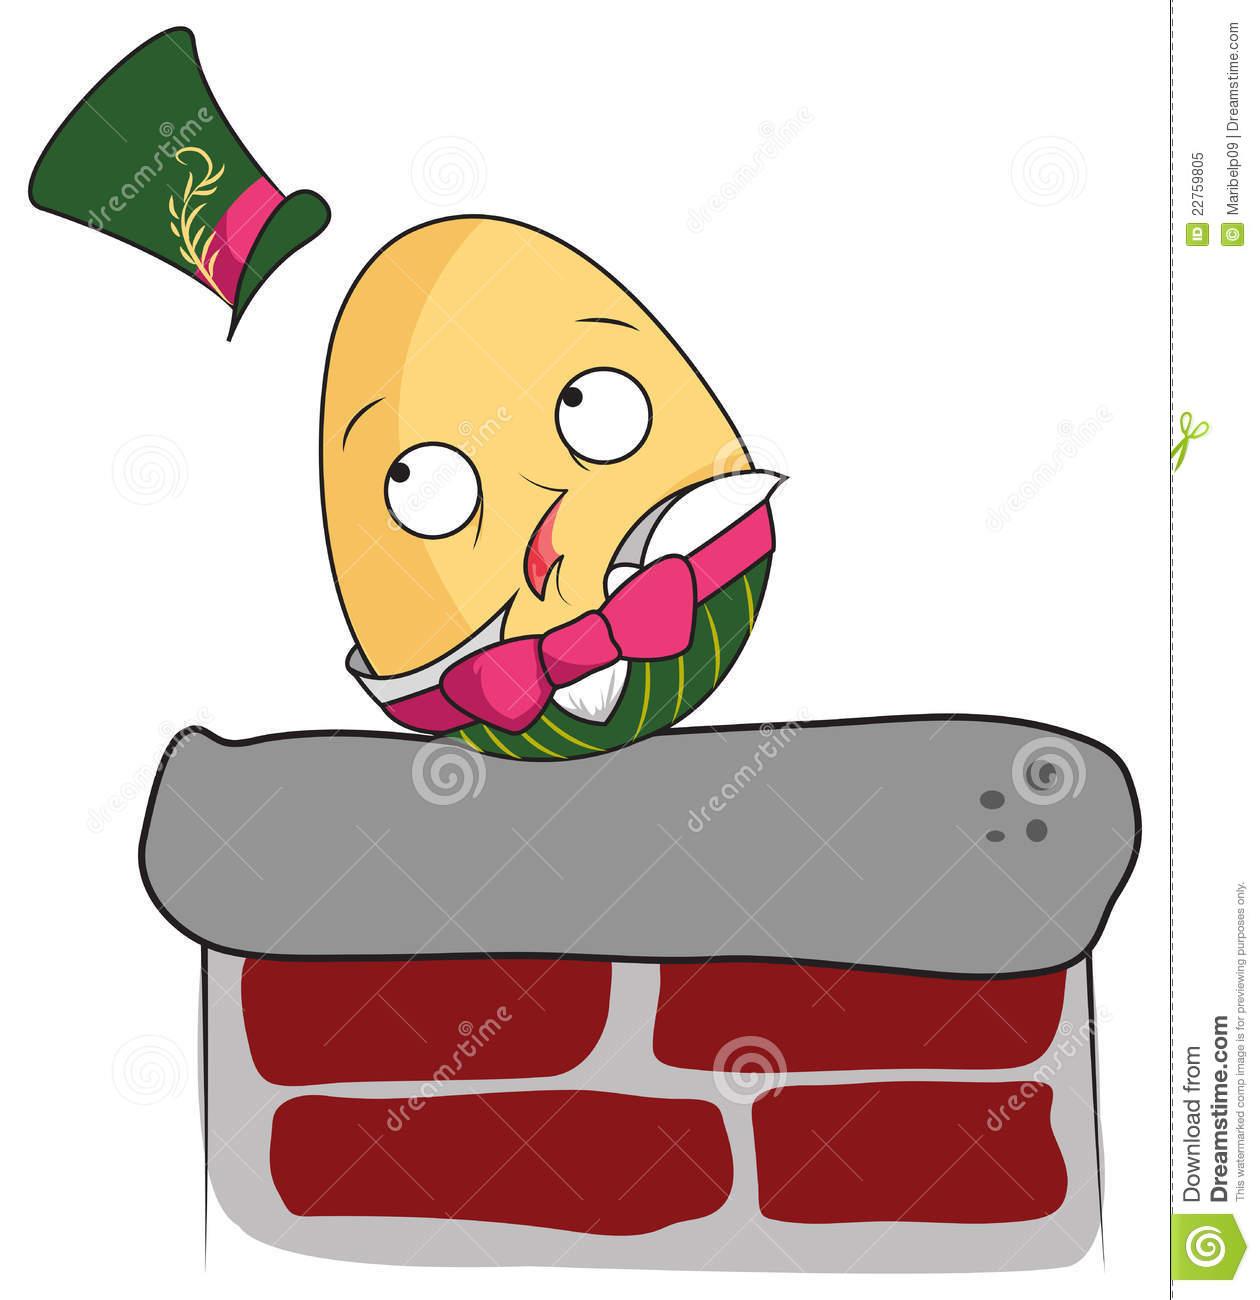 Humpty Dumpty-Humpty Dumpty-16